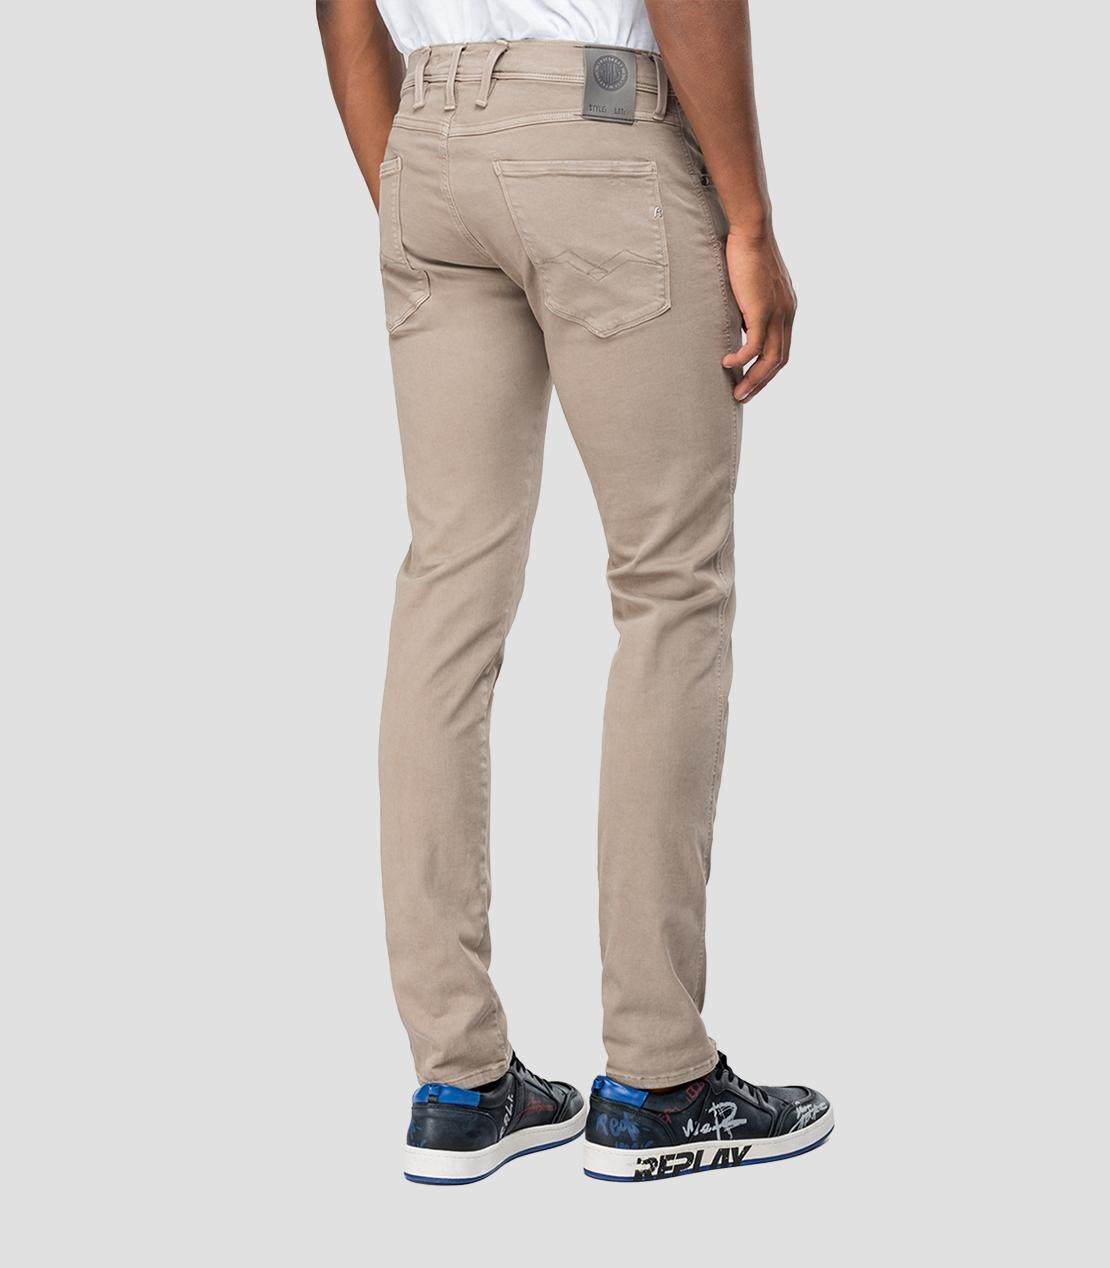 REPLAY jean coupe slim hyperflex-3